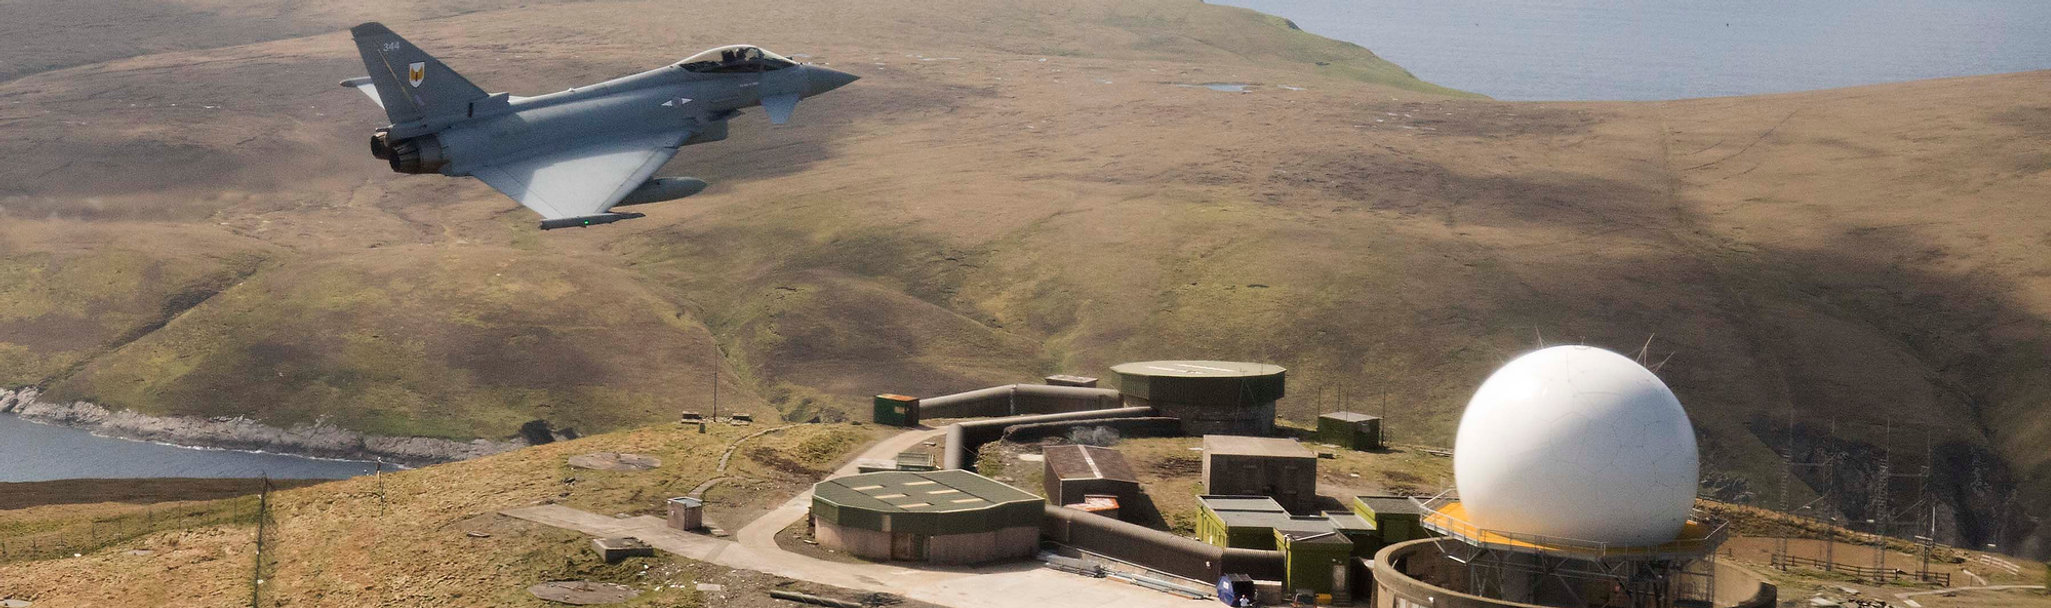 Military RADAR Air Conditioning